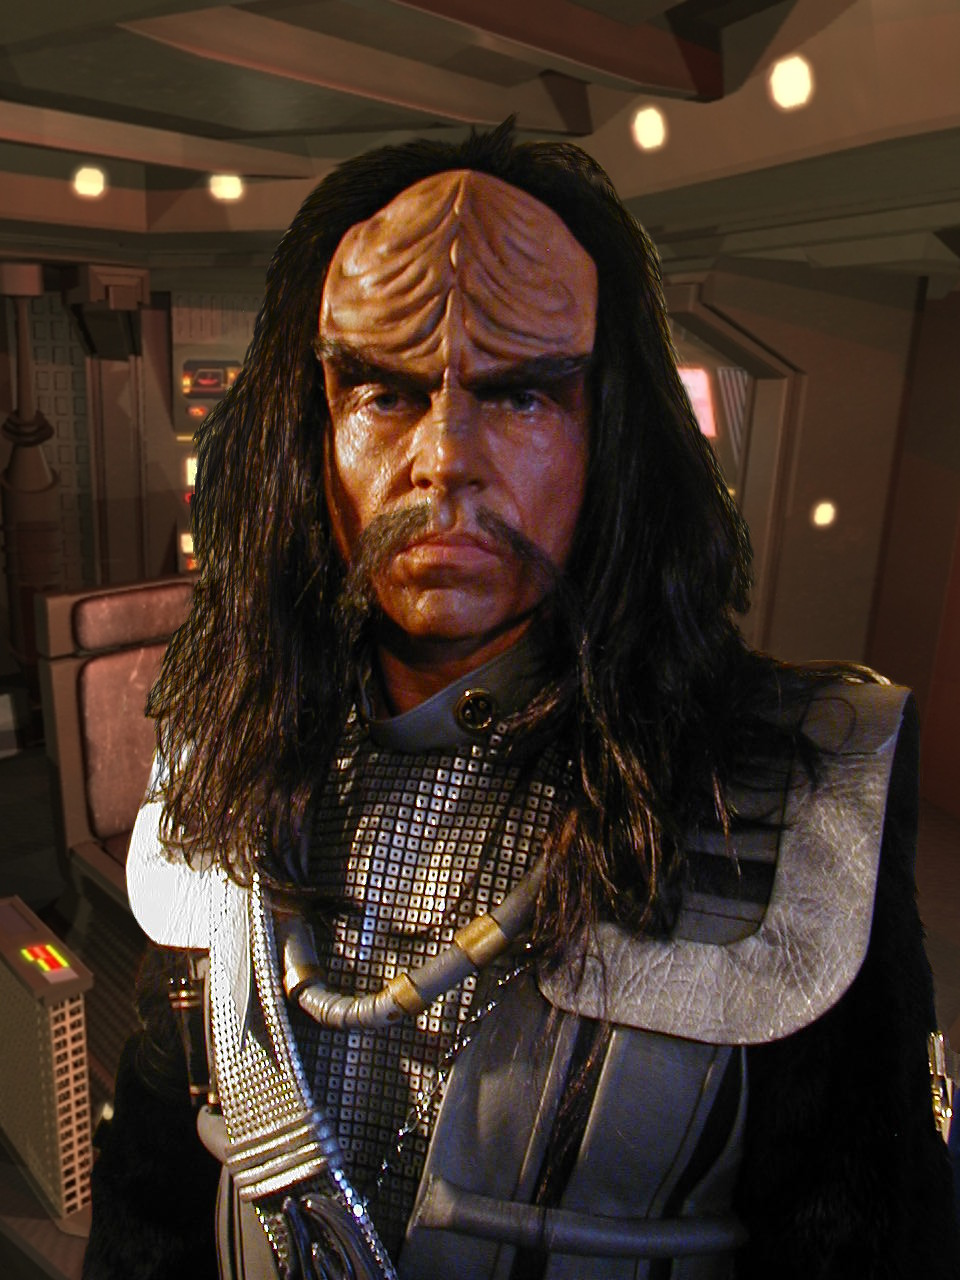 John Carrigan as Klingon, Star Trek:  Of Gods and Men - Sculpt, Prosthetic Appliance, Makeup by Tim Vittetoe, ImpaQt FX